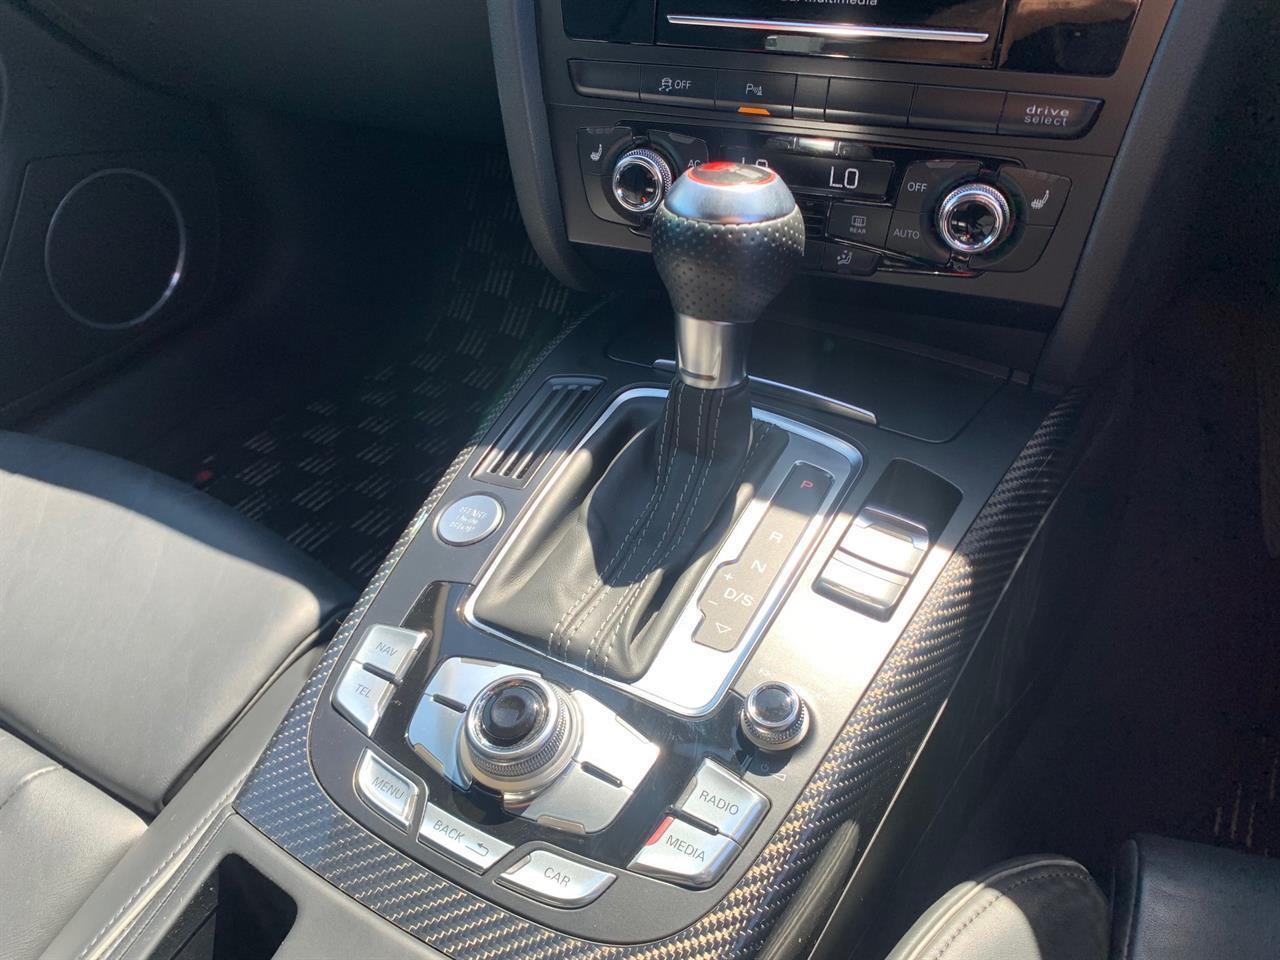 image-13, 2013 Audi RS4 4.2 V8 Quattro FSI Wagon at Christchurch